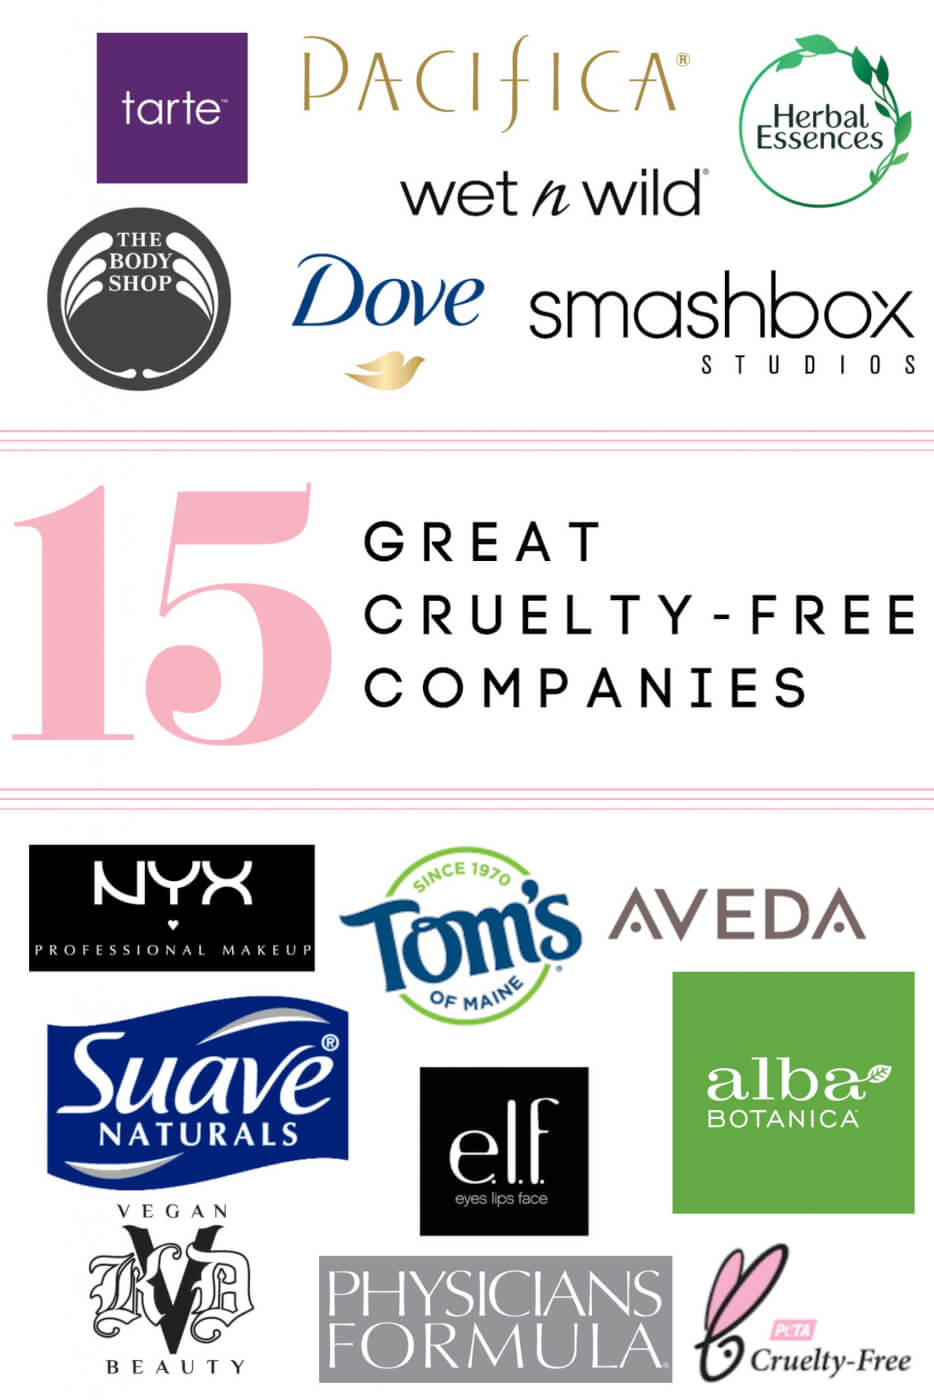 15 great cruelty-free companies